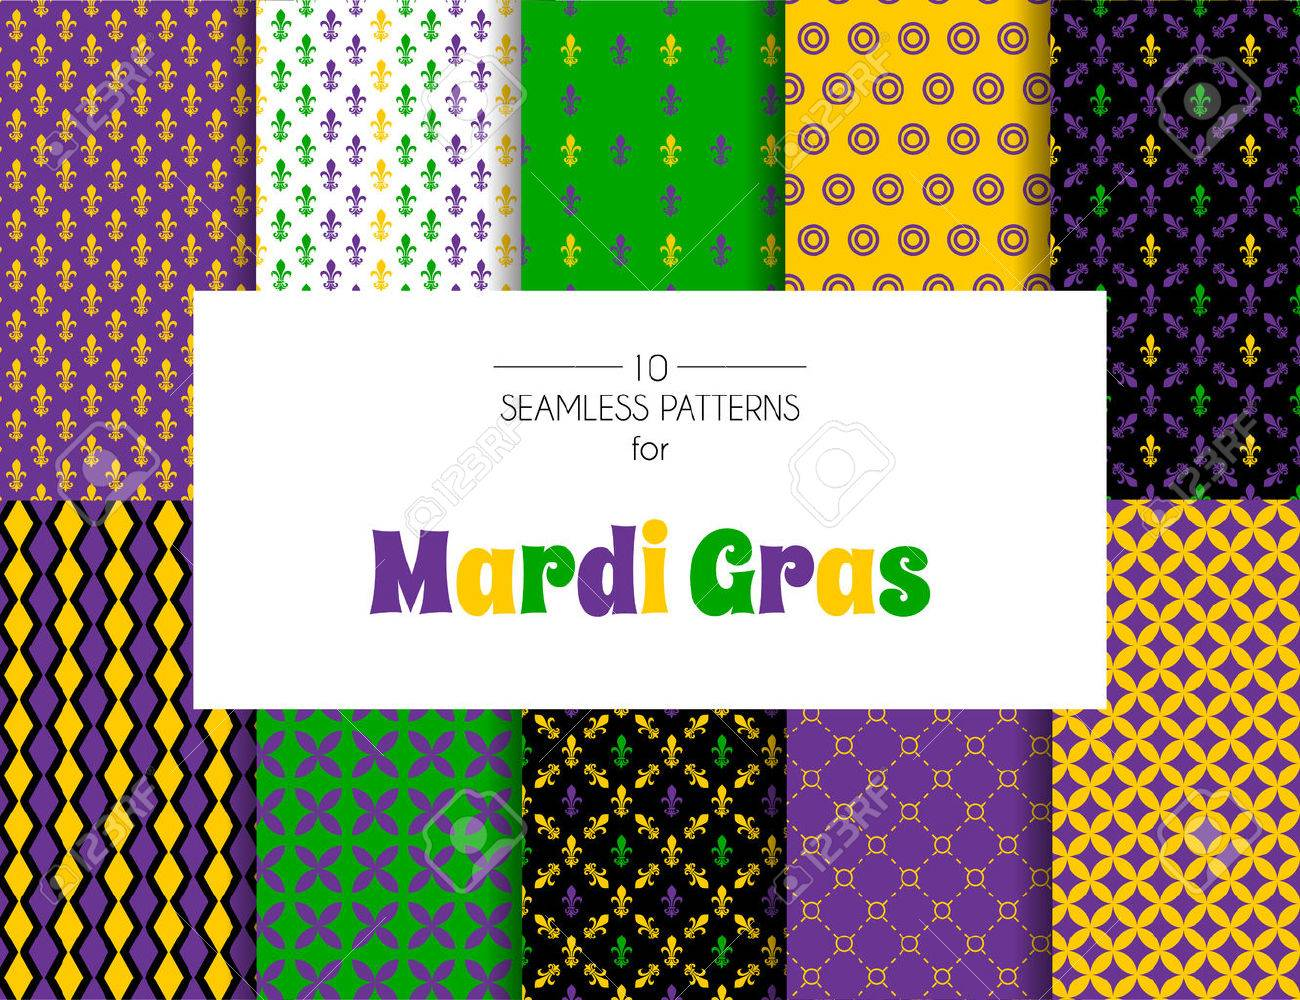 Vector illustration of Mardi Gras pattern backgrounds - 36657318